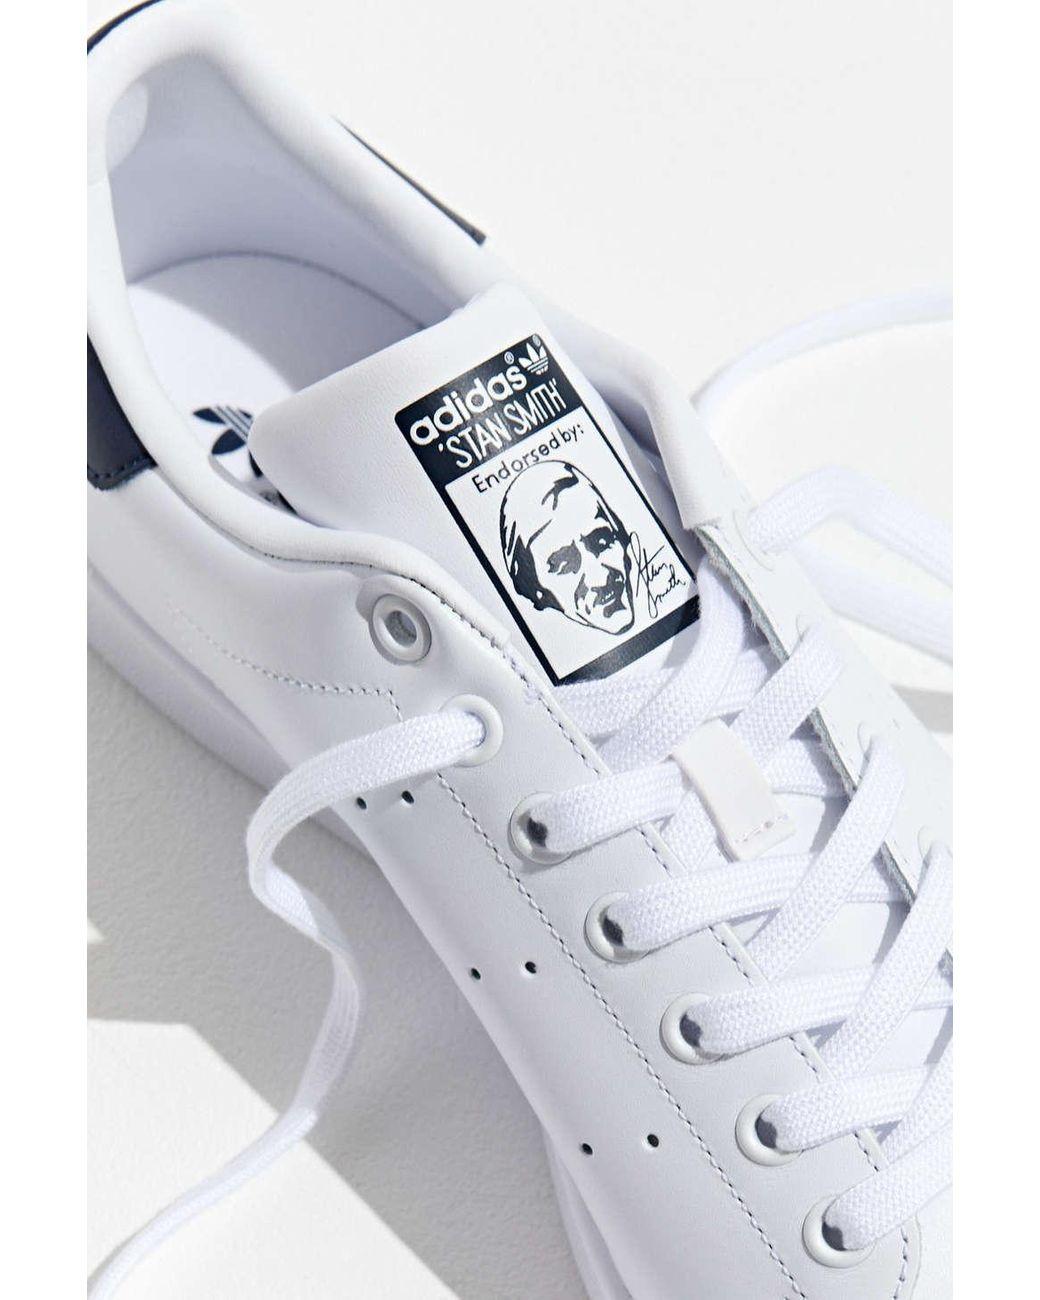 Men's Adidas Originals Classic Stan Smith Sneaker